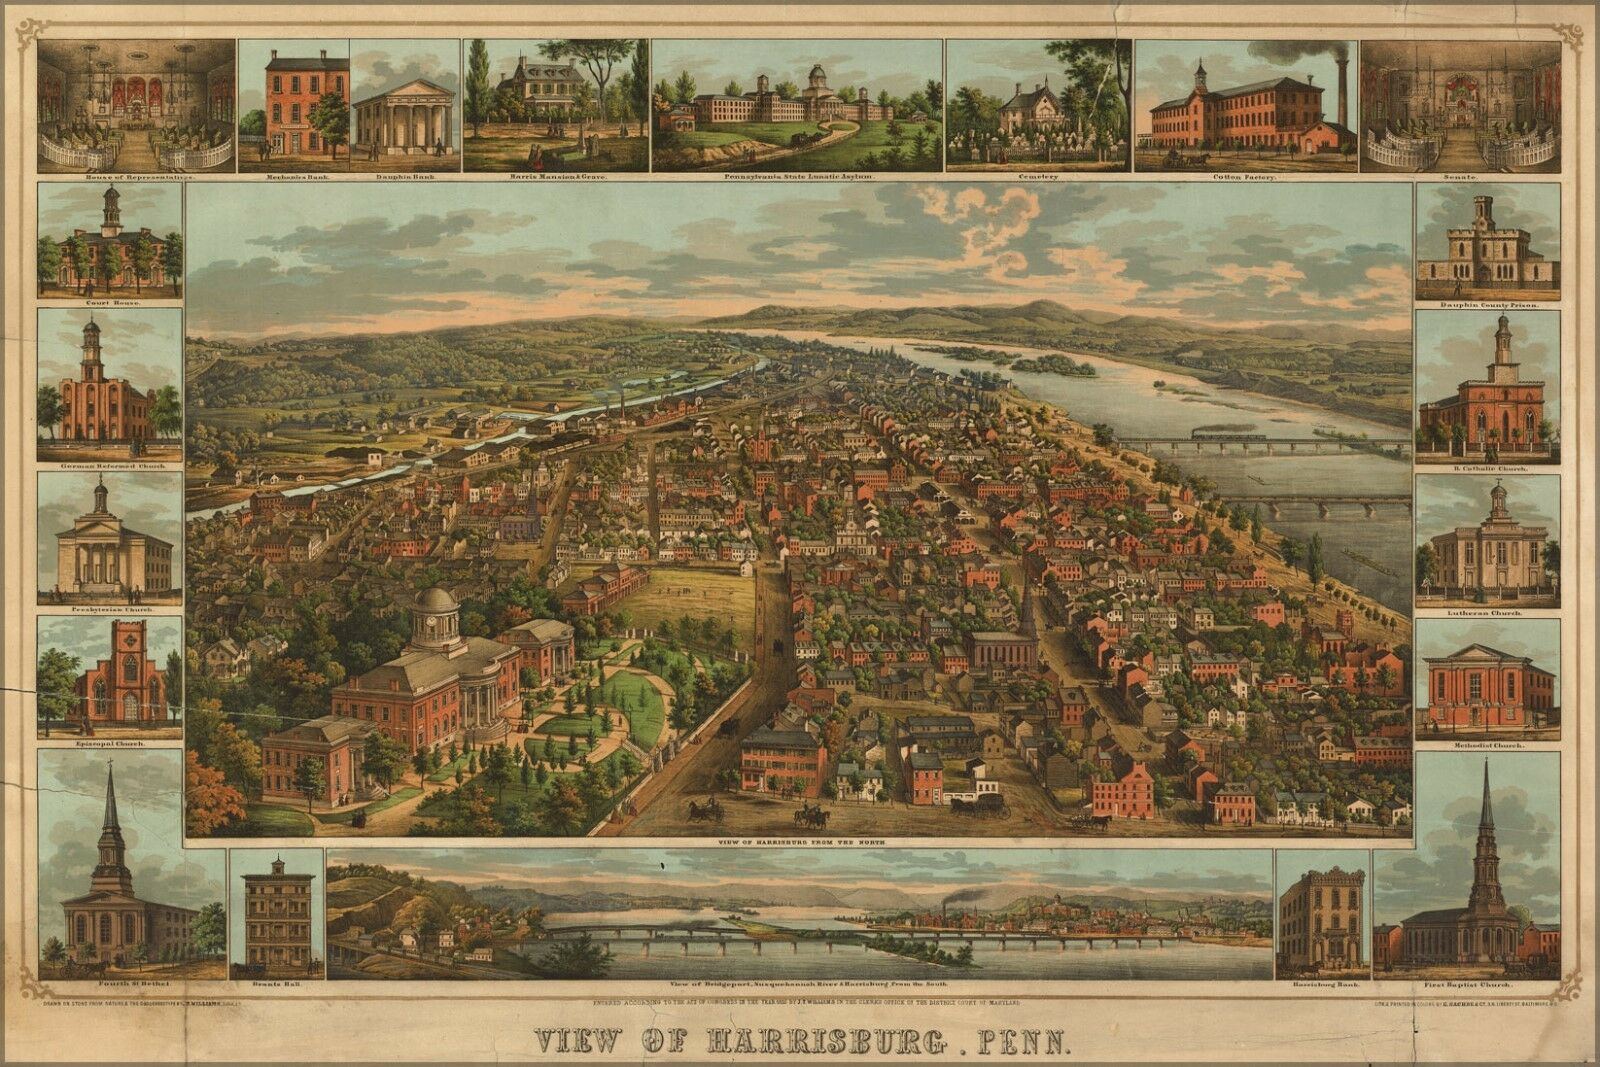 Poster, Many Größes; Birdseye View Map Of Harrisburg, Penn. 1855